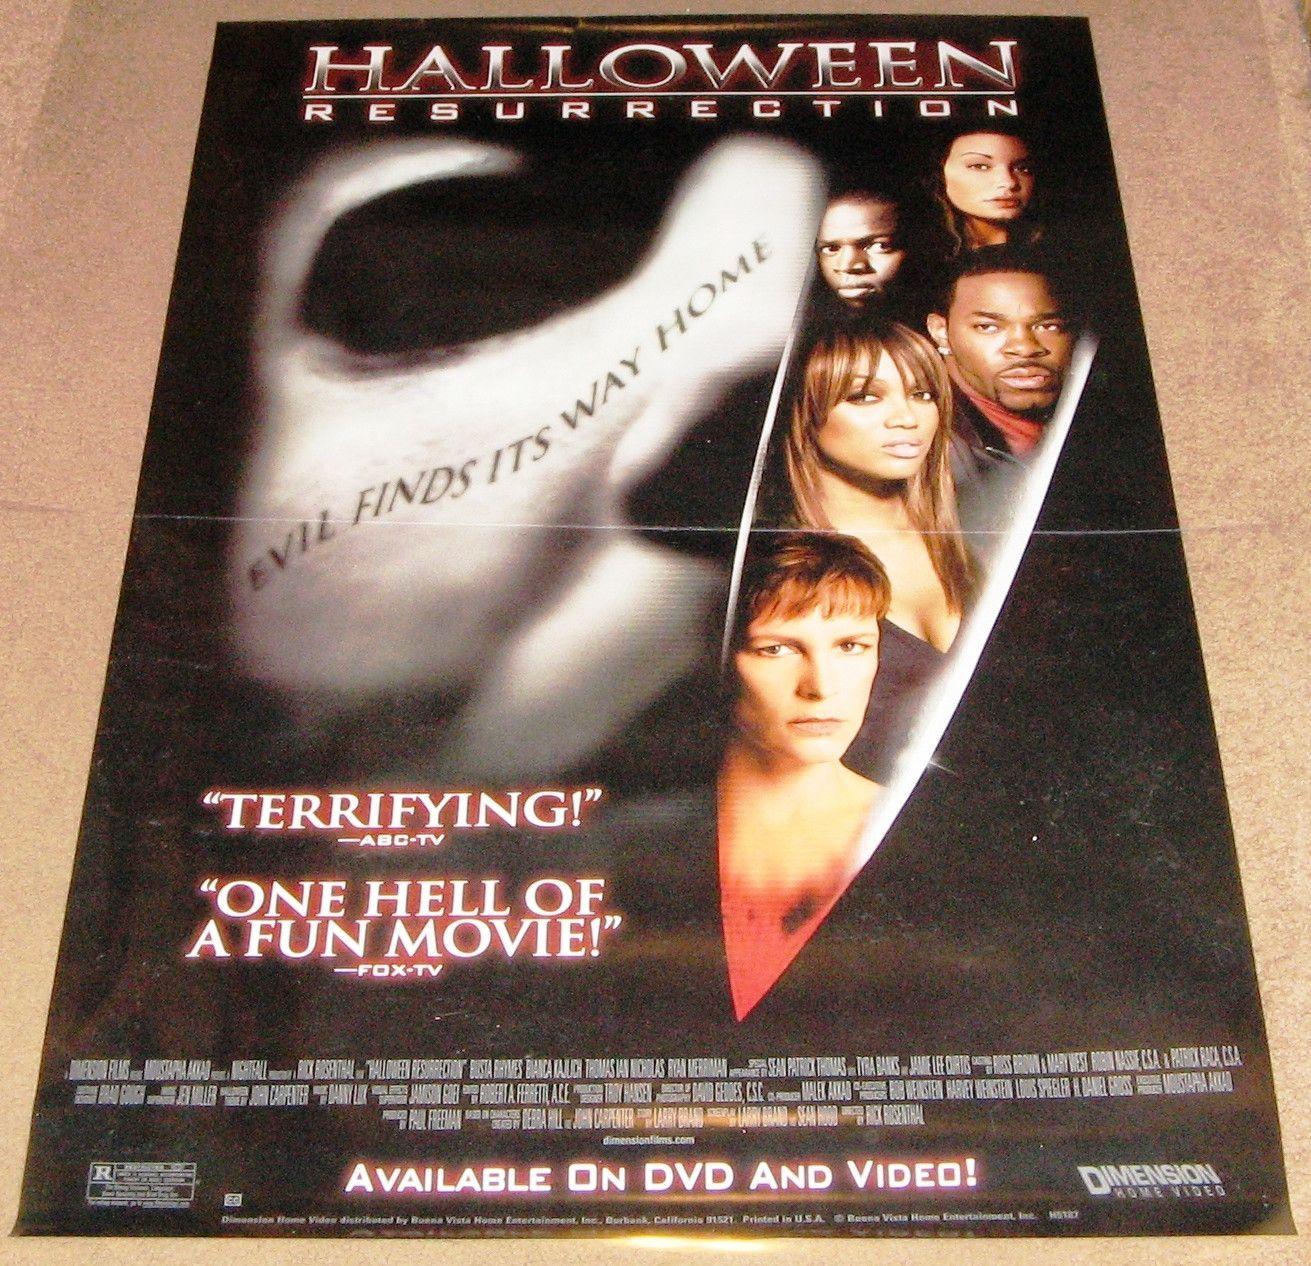 halloween resurrection movie poster 27x40 used bianca kajlich brad loree katee sackhoff brent - Bianca Kajlich Halloween